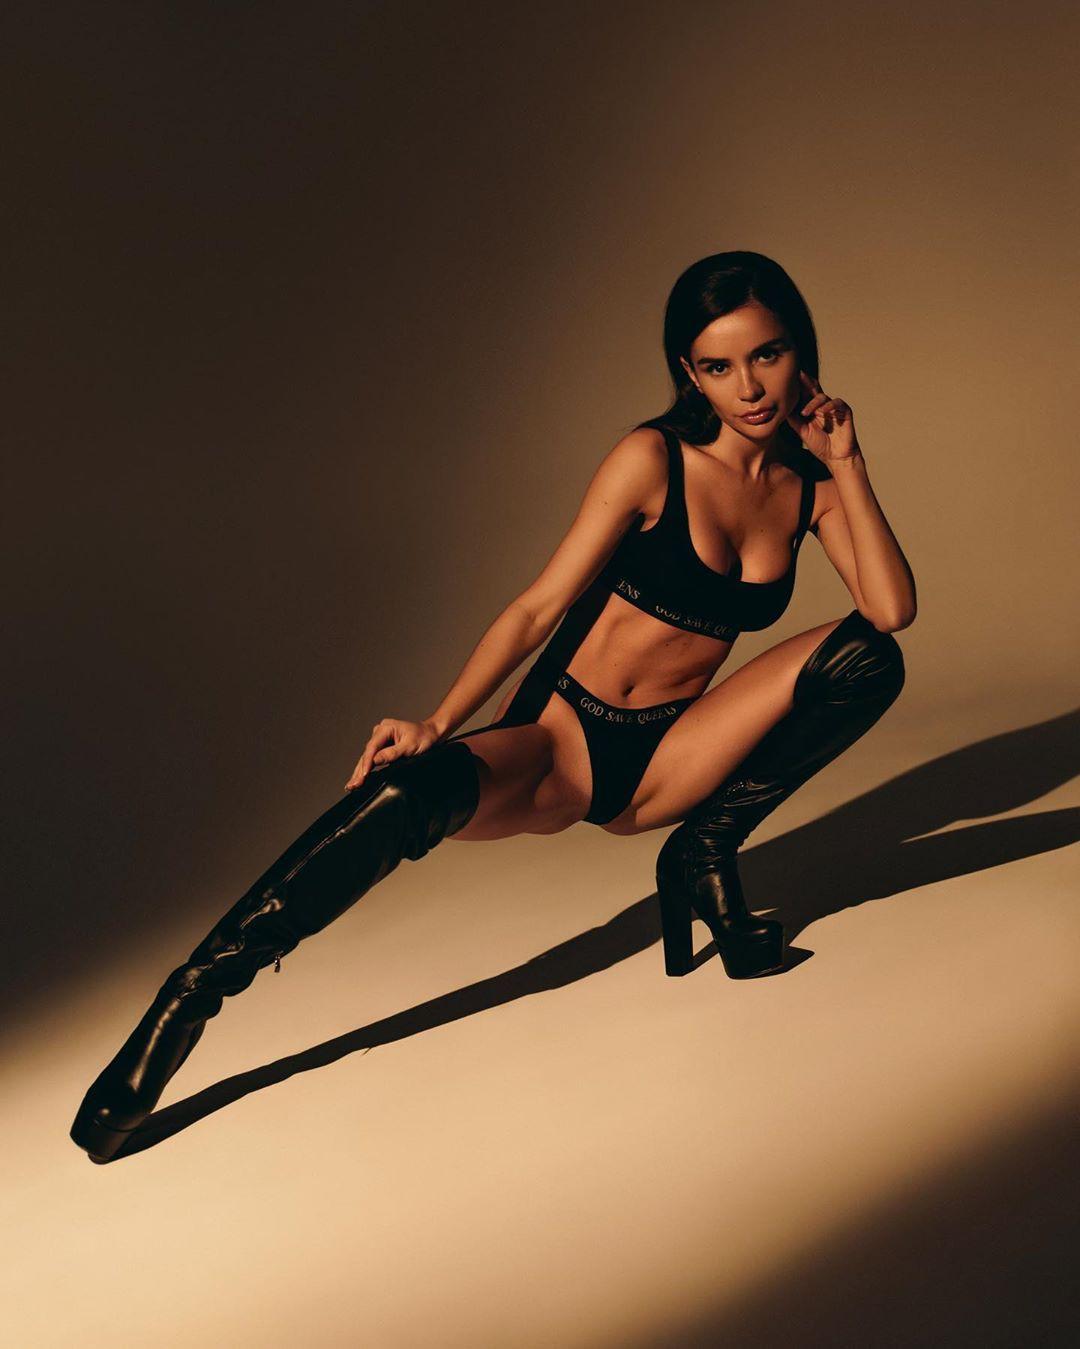 Ekaterina Zueva fetish model colour outfit, photoshoot poses, fashion photography